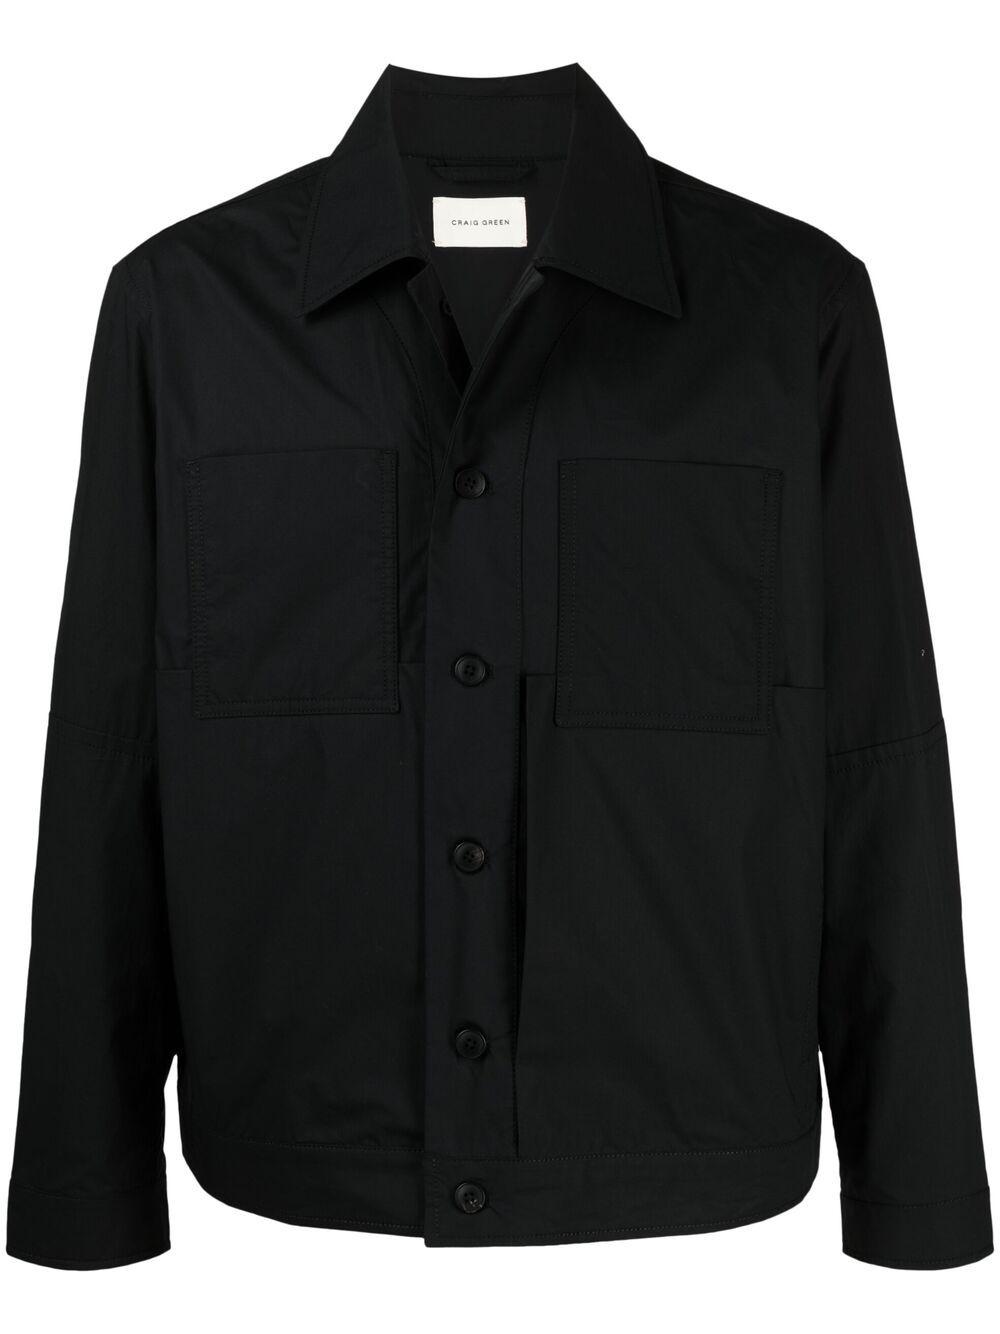 Craig green pointed collar shirt jacket man CRAIG GREEN | Jackets | CGSS21CWOJKT13BLACK